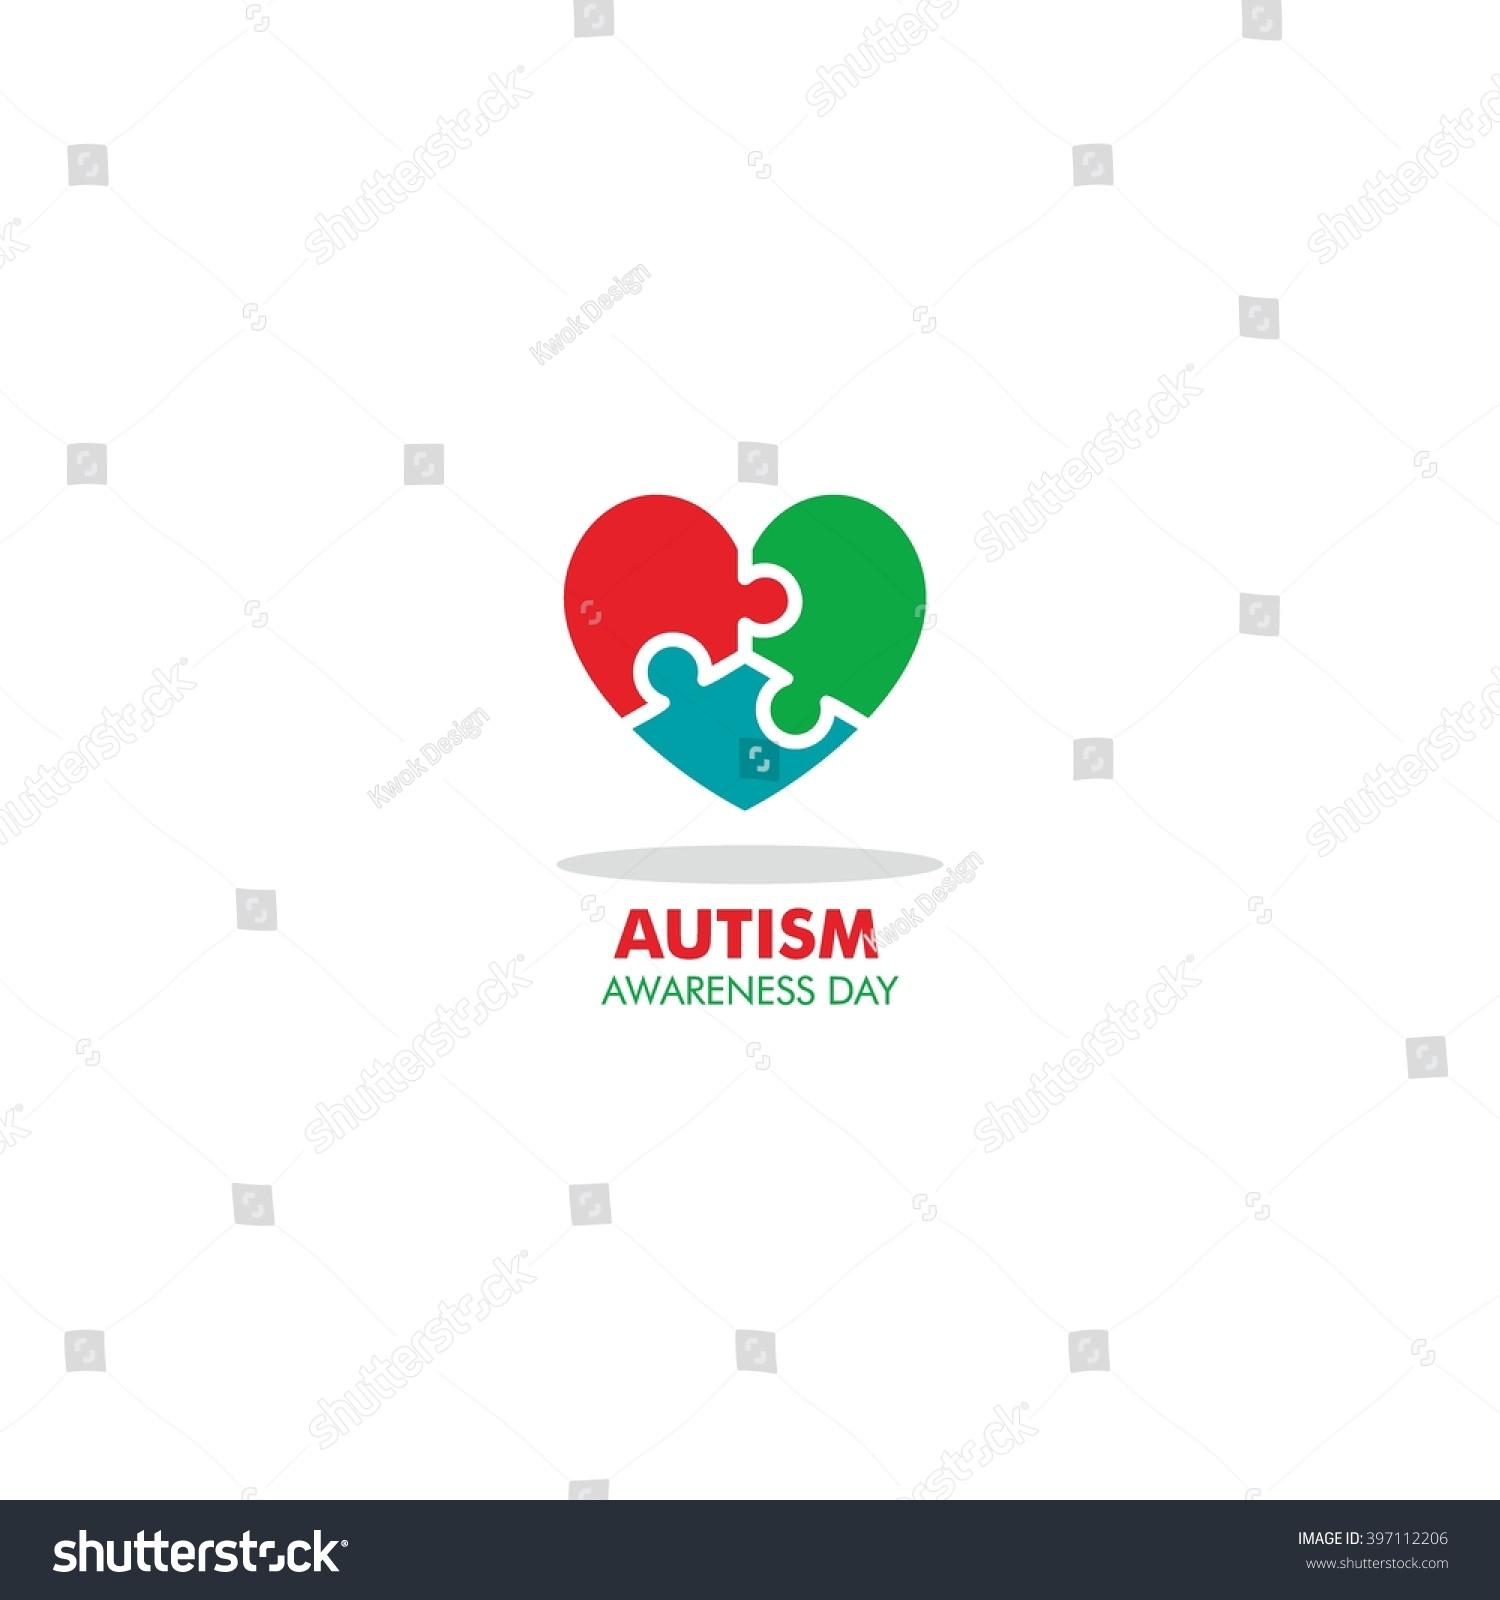 World autism awareness day logo design stock vector 397112206 world autism awareness day logo design template vector illustration colorful puzzles symbol biocorpaavc